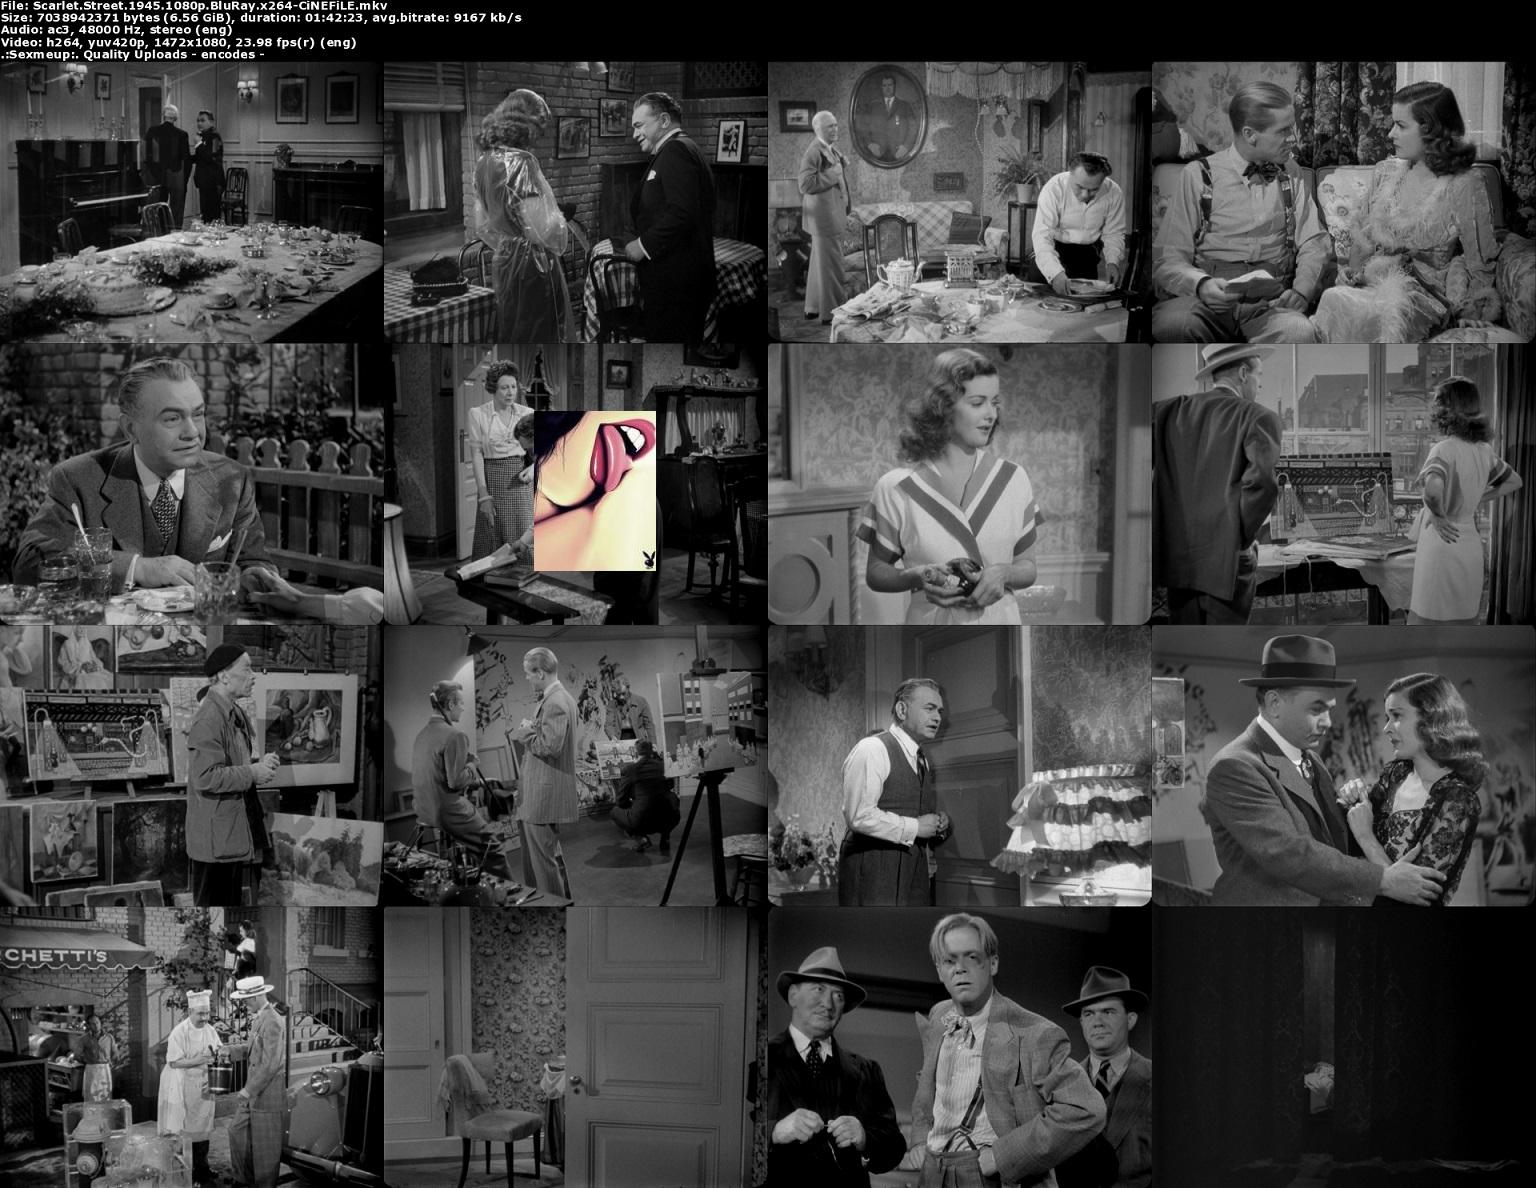 Scarlet.Street.1945.1080p.BluRay.x264-Ci